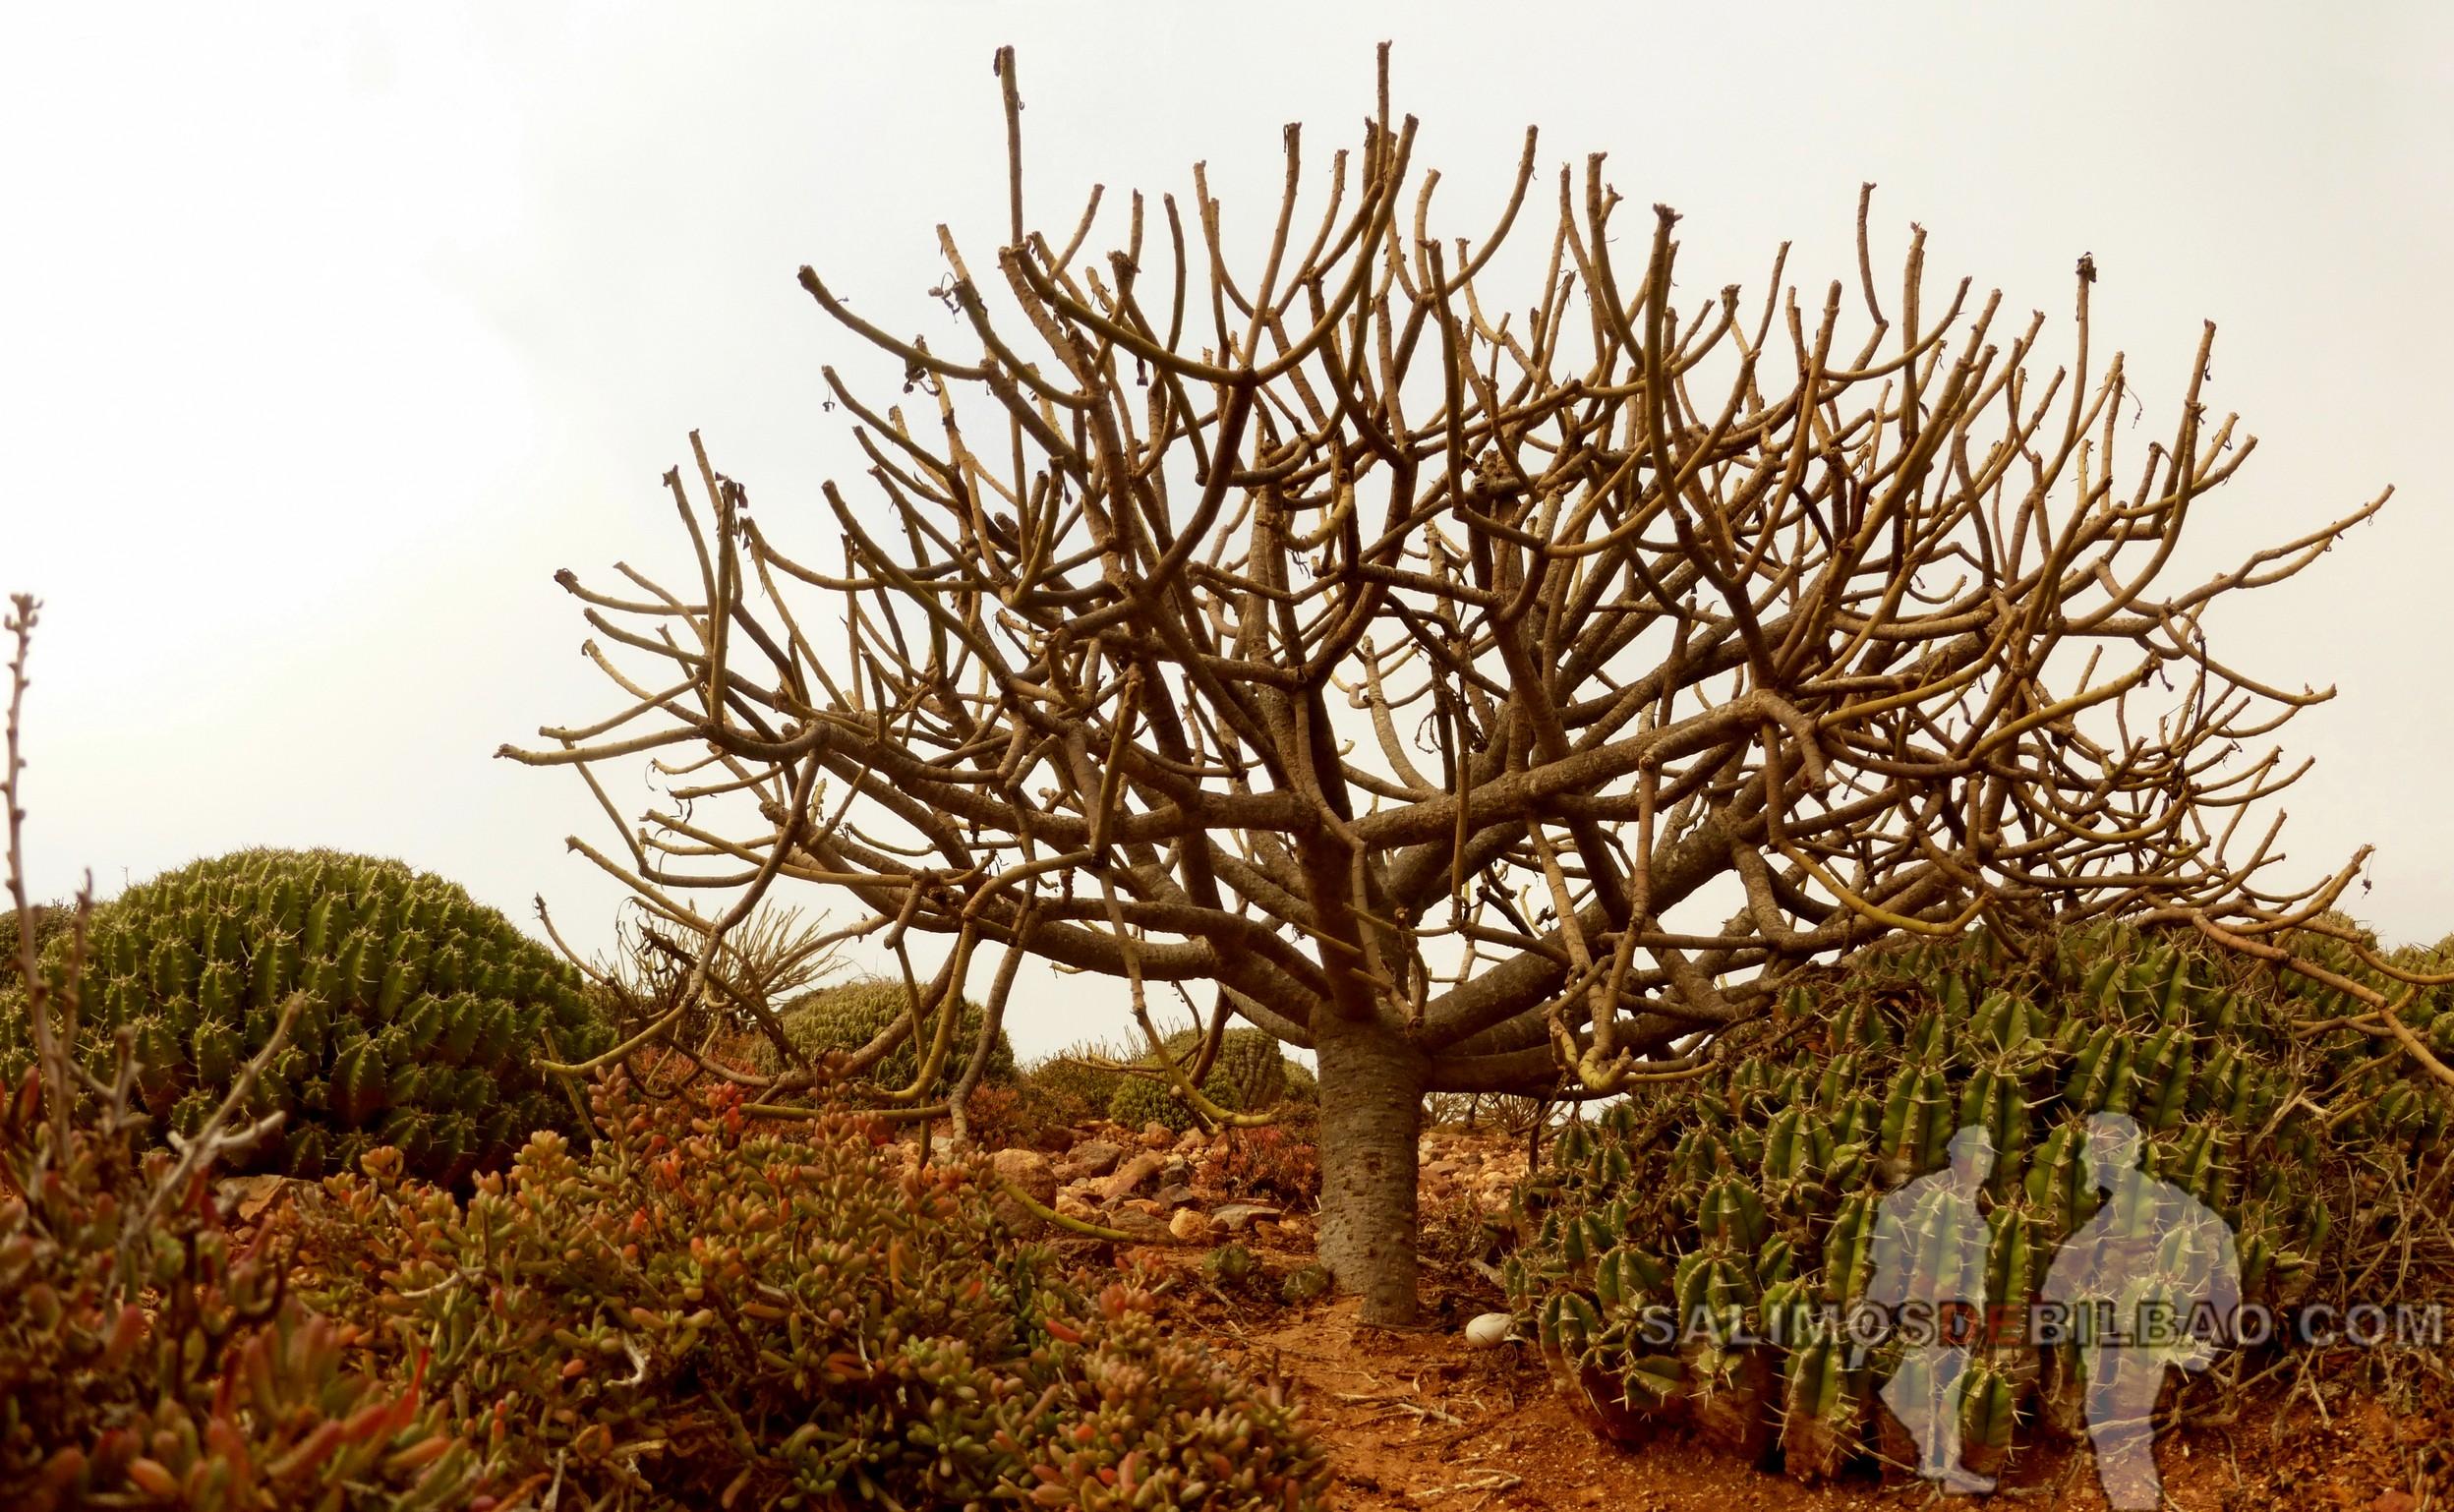 416. Pano, Árbol, Camino de Sidi Ifni a Legzira